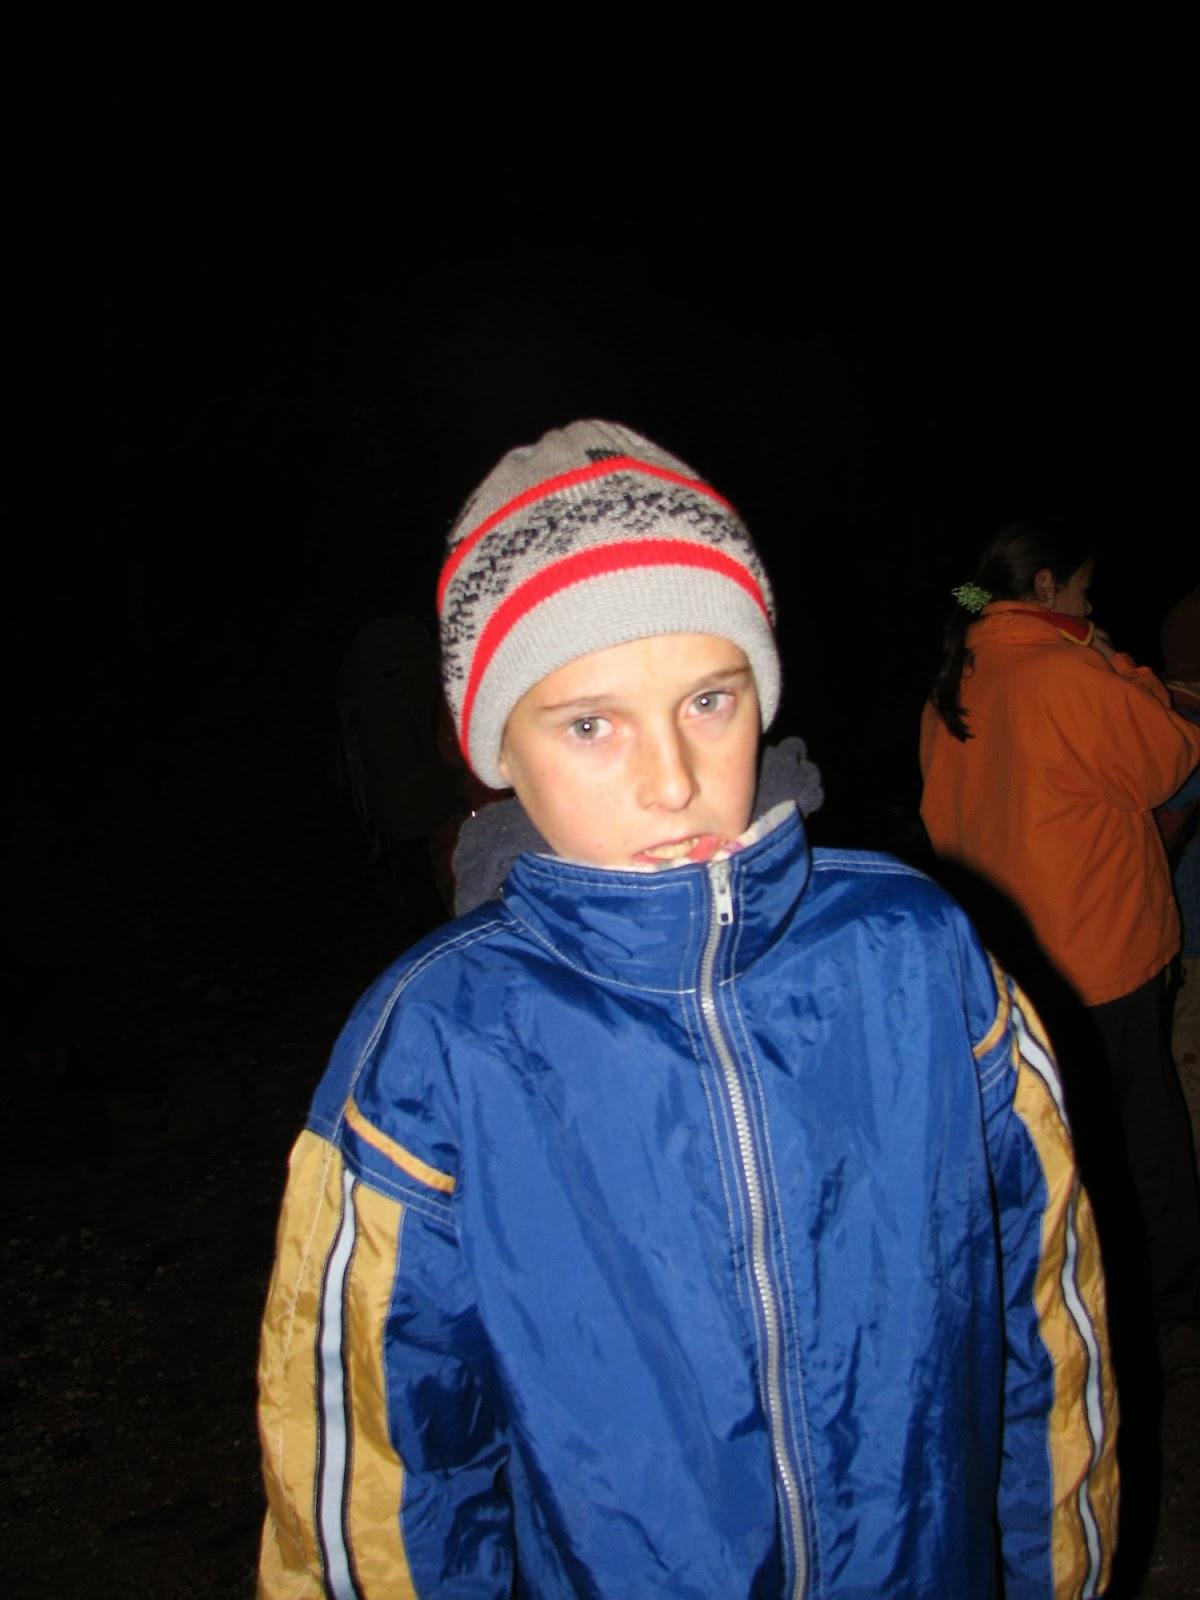 Vodov izlet, Ilirska Bistrica 2005 - Picture%2B065.jpg